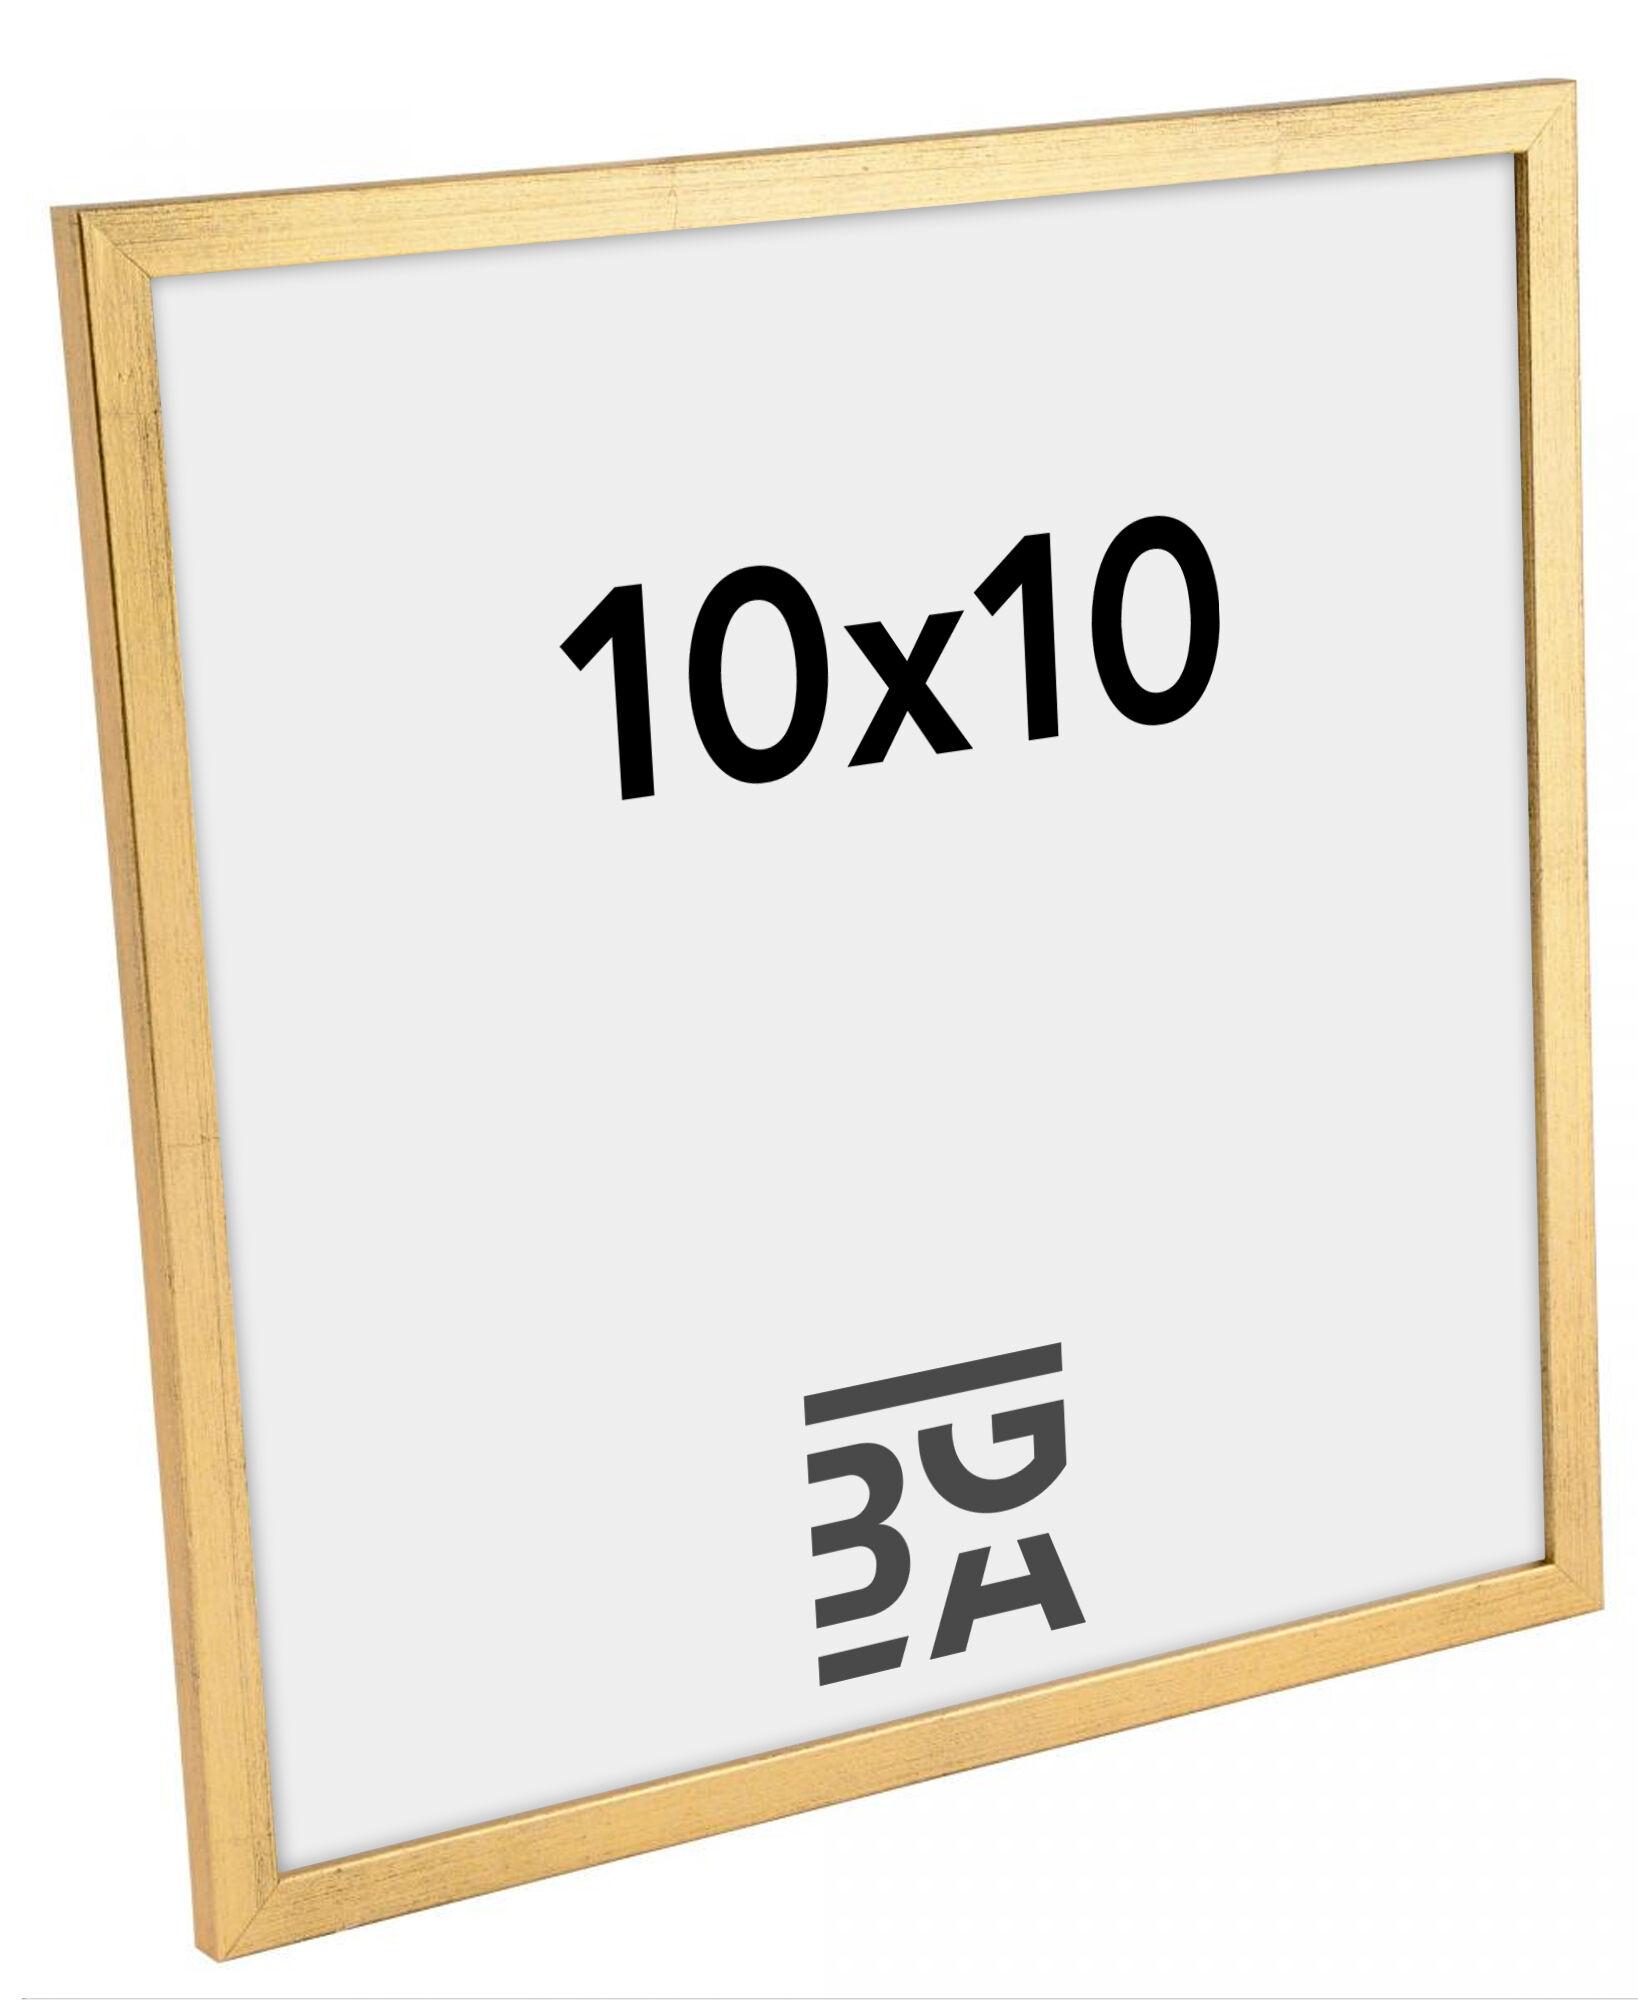 Estancia Galant Kullanvärinen 10x10 cm